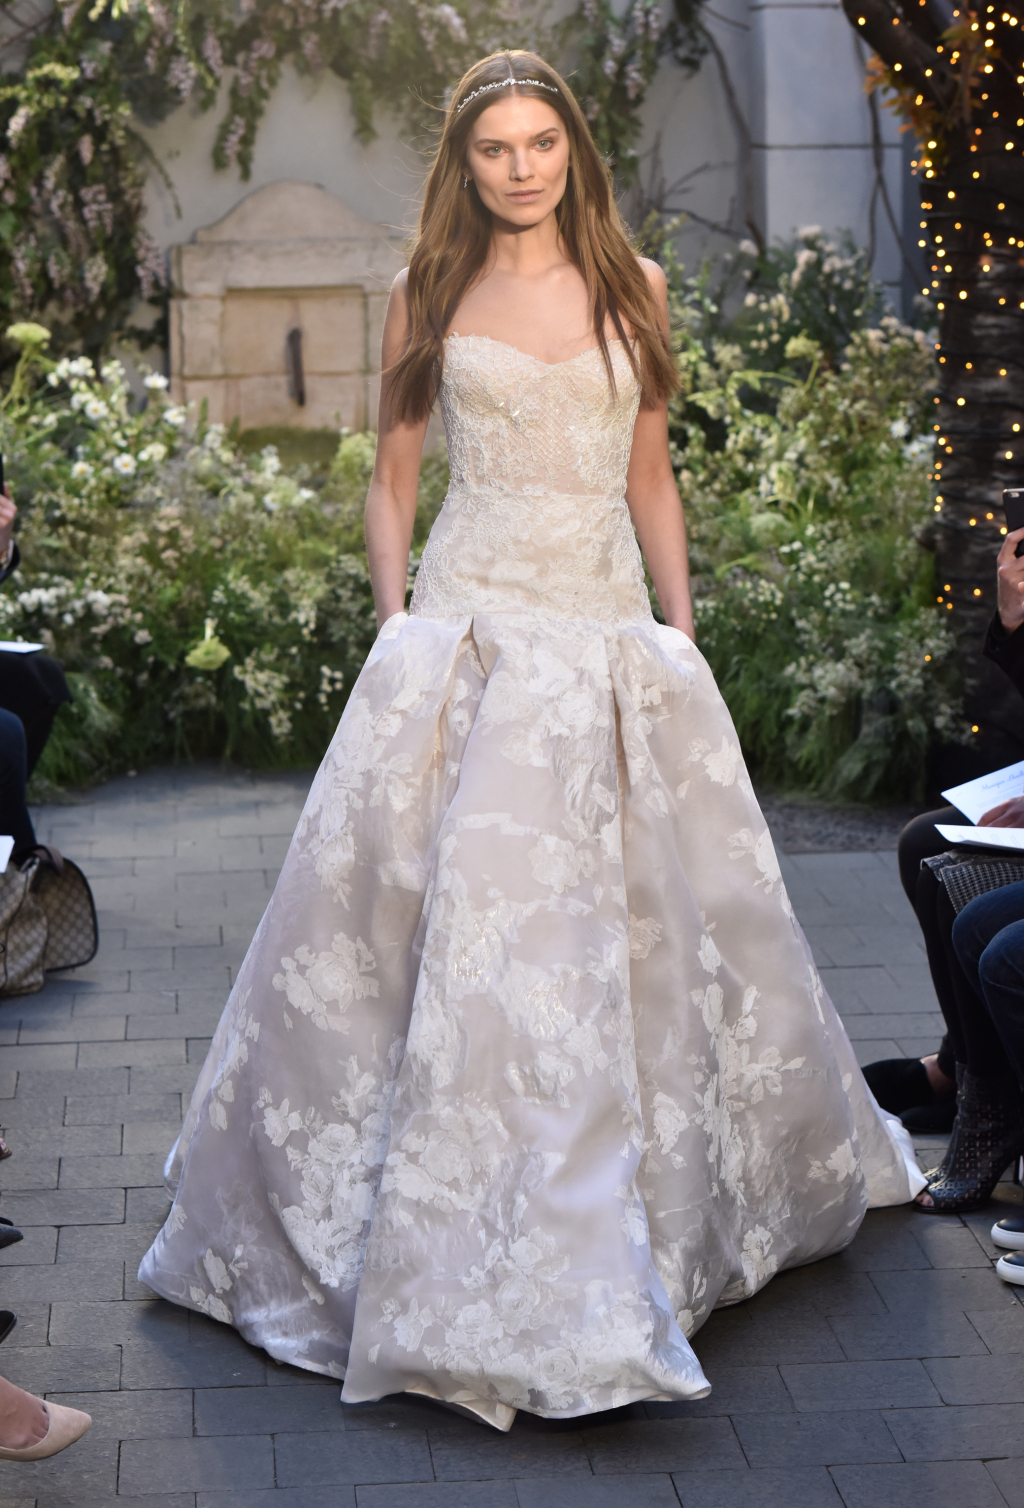 Monique Lhuillier Wedding Dress Collection - Arabia Weddings